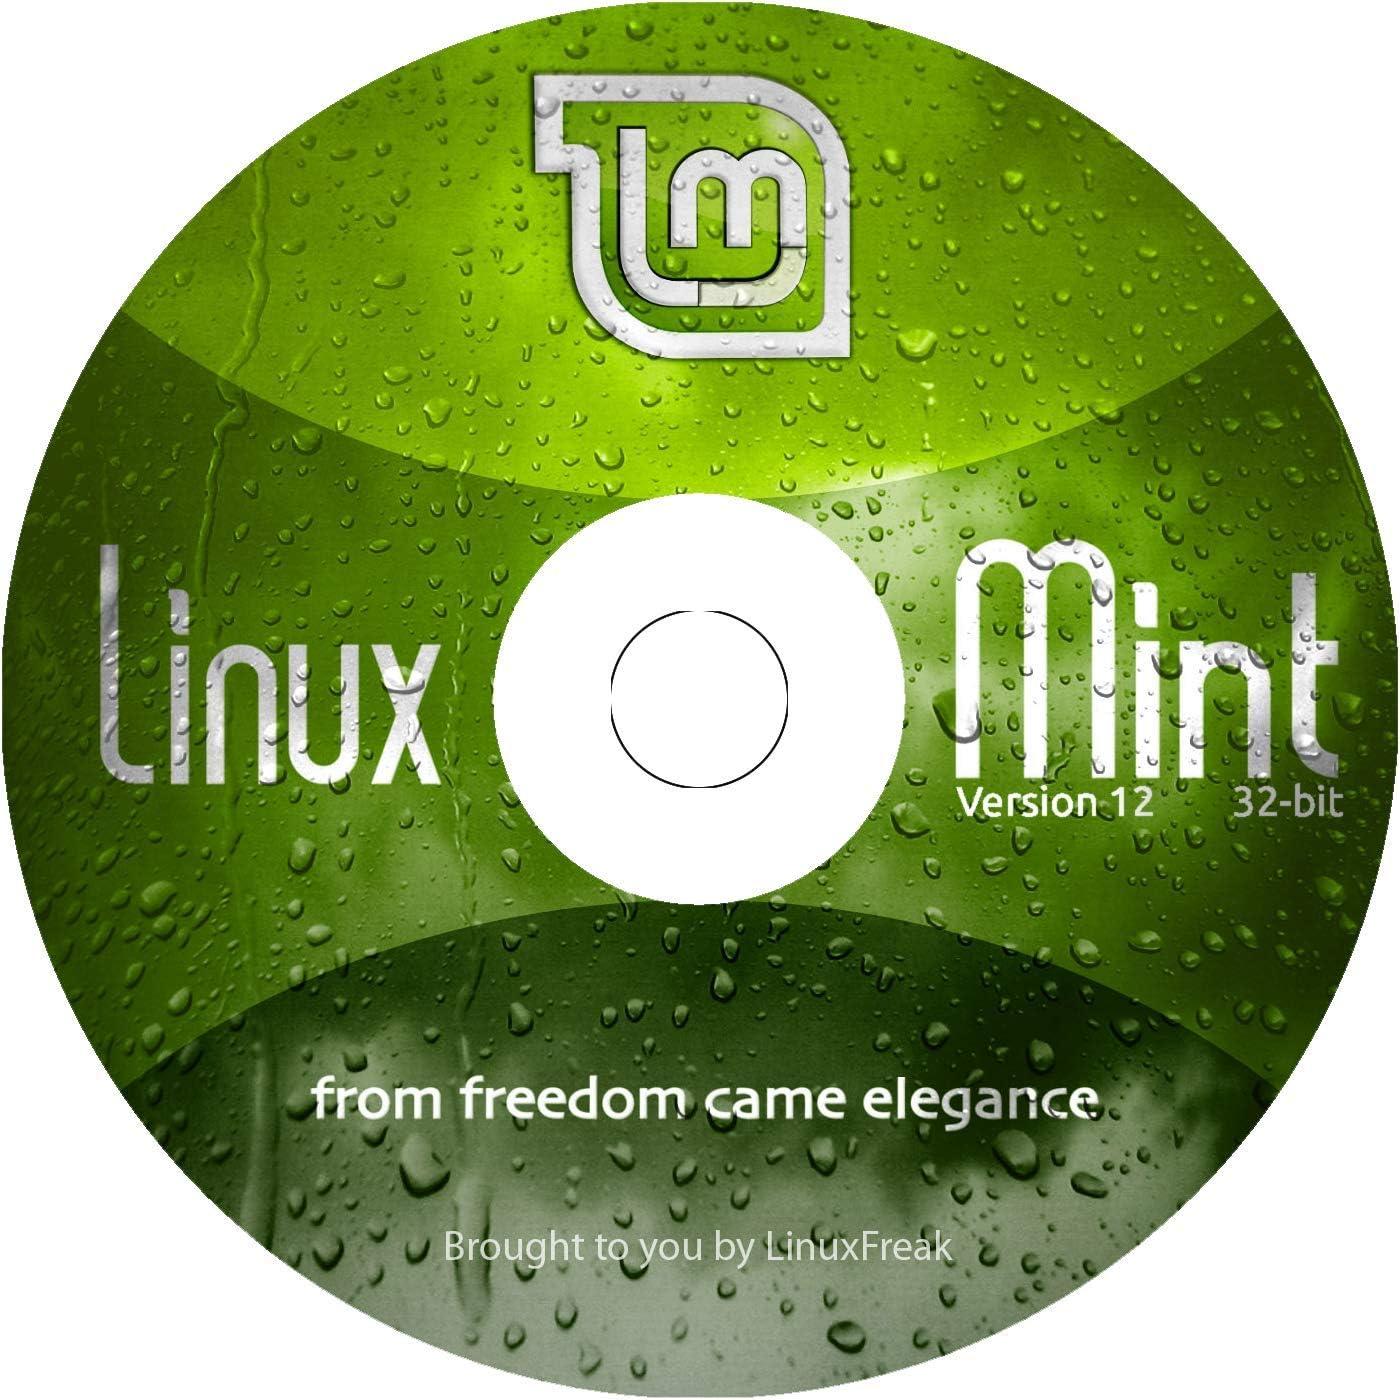 Linux Mint 12 Live Sale item Max 64% OFF DVD 32-bit - Plus version G Quick-Reference